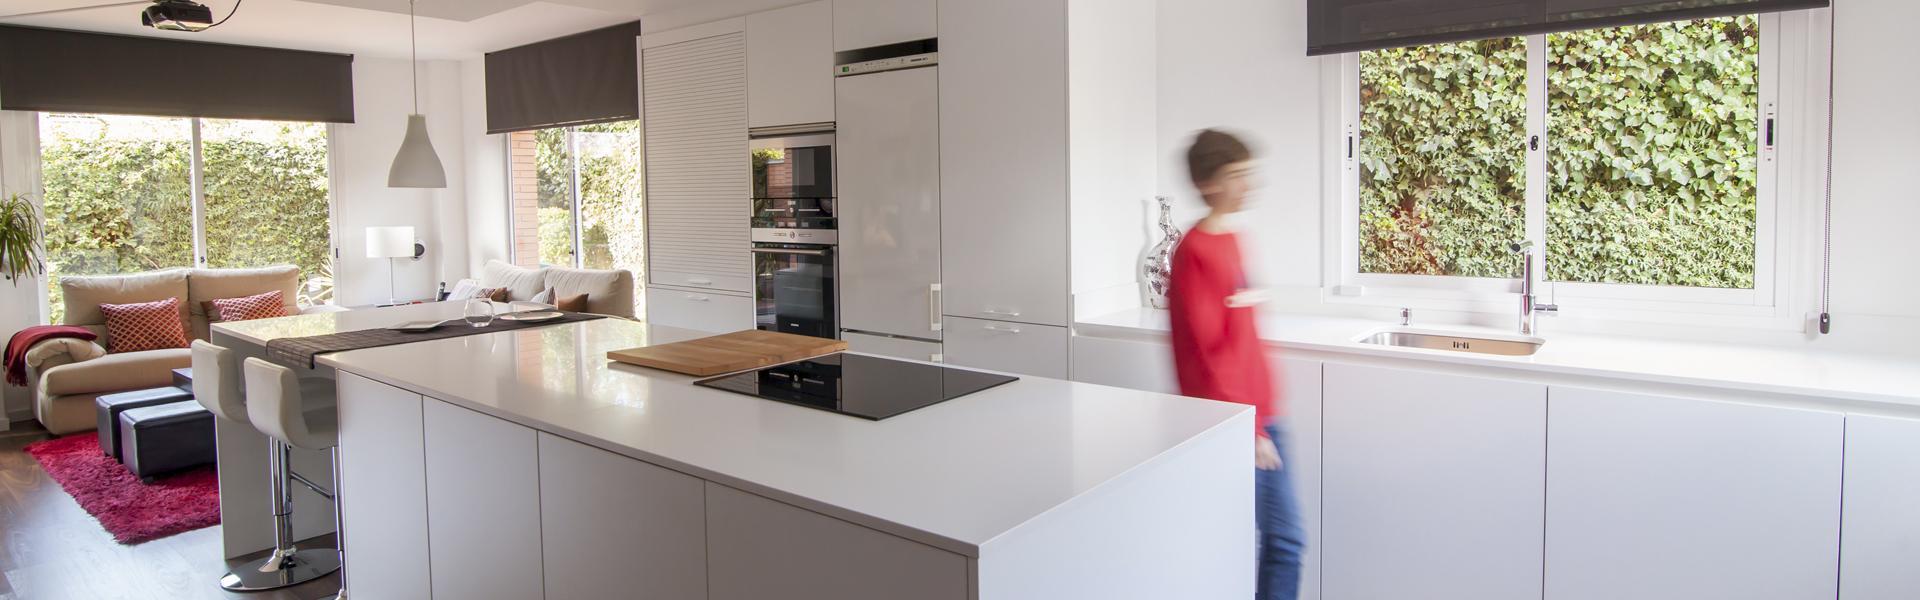 Salon Con Cocina - Diseños Arquitectónicos - Mimasku.com